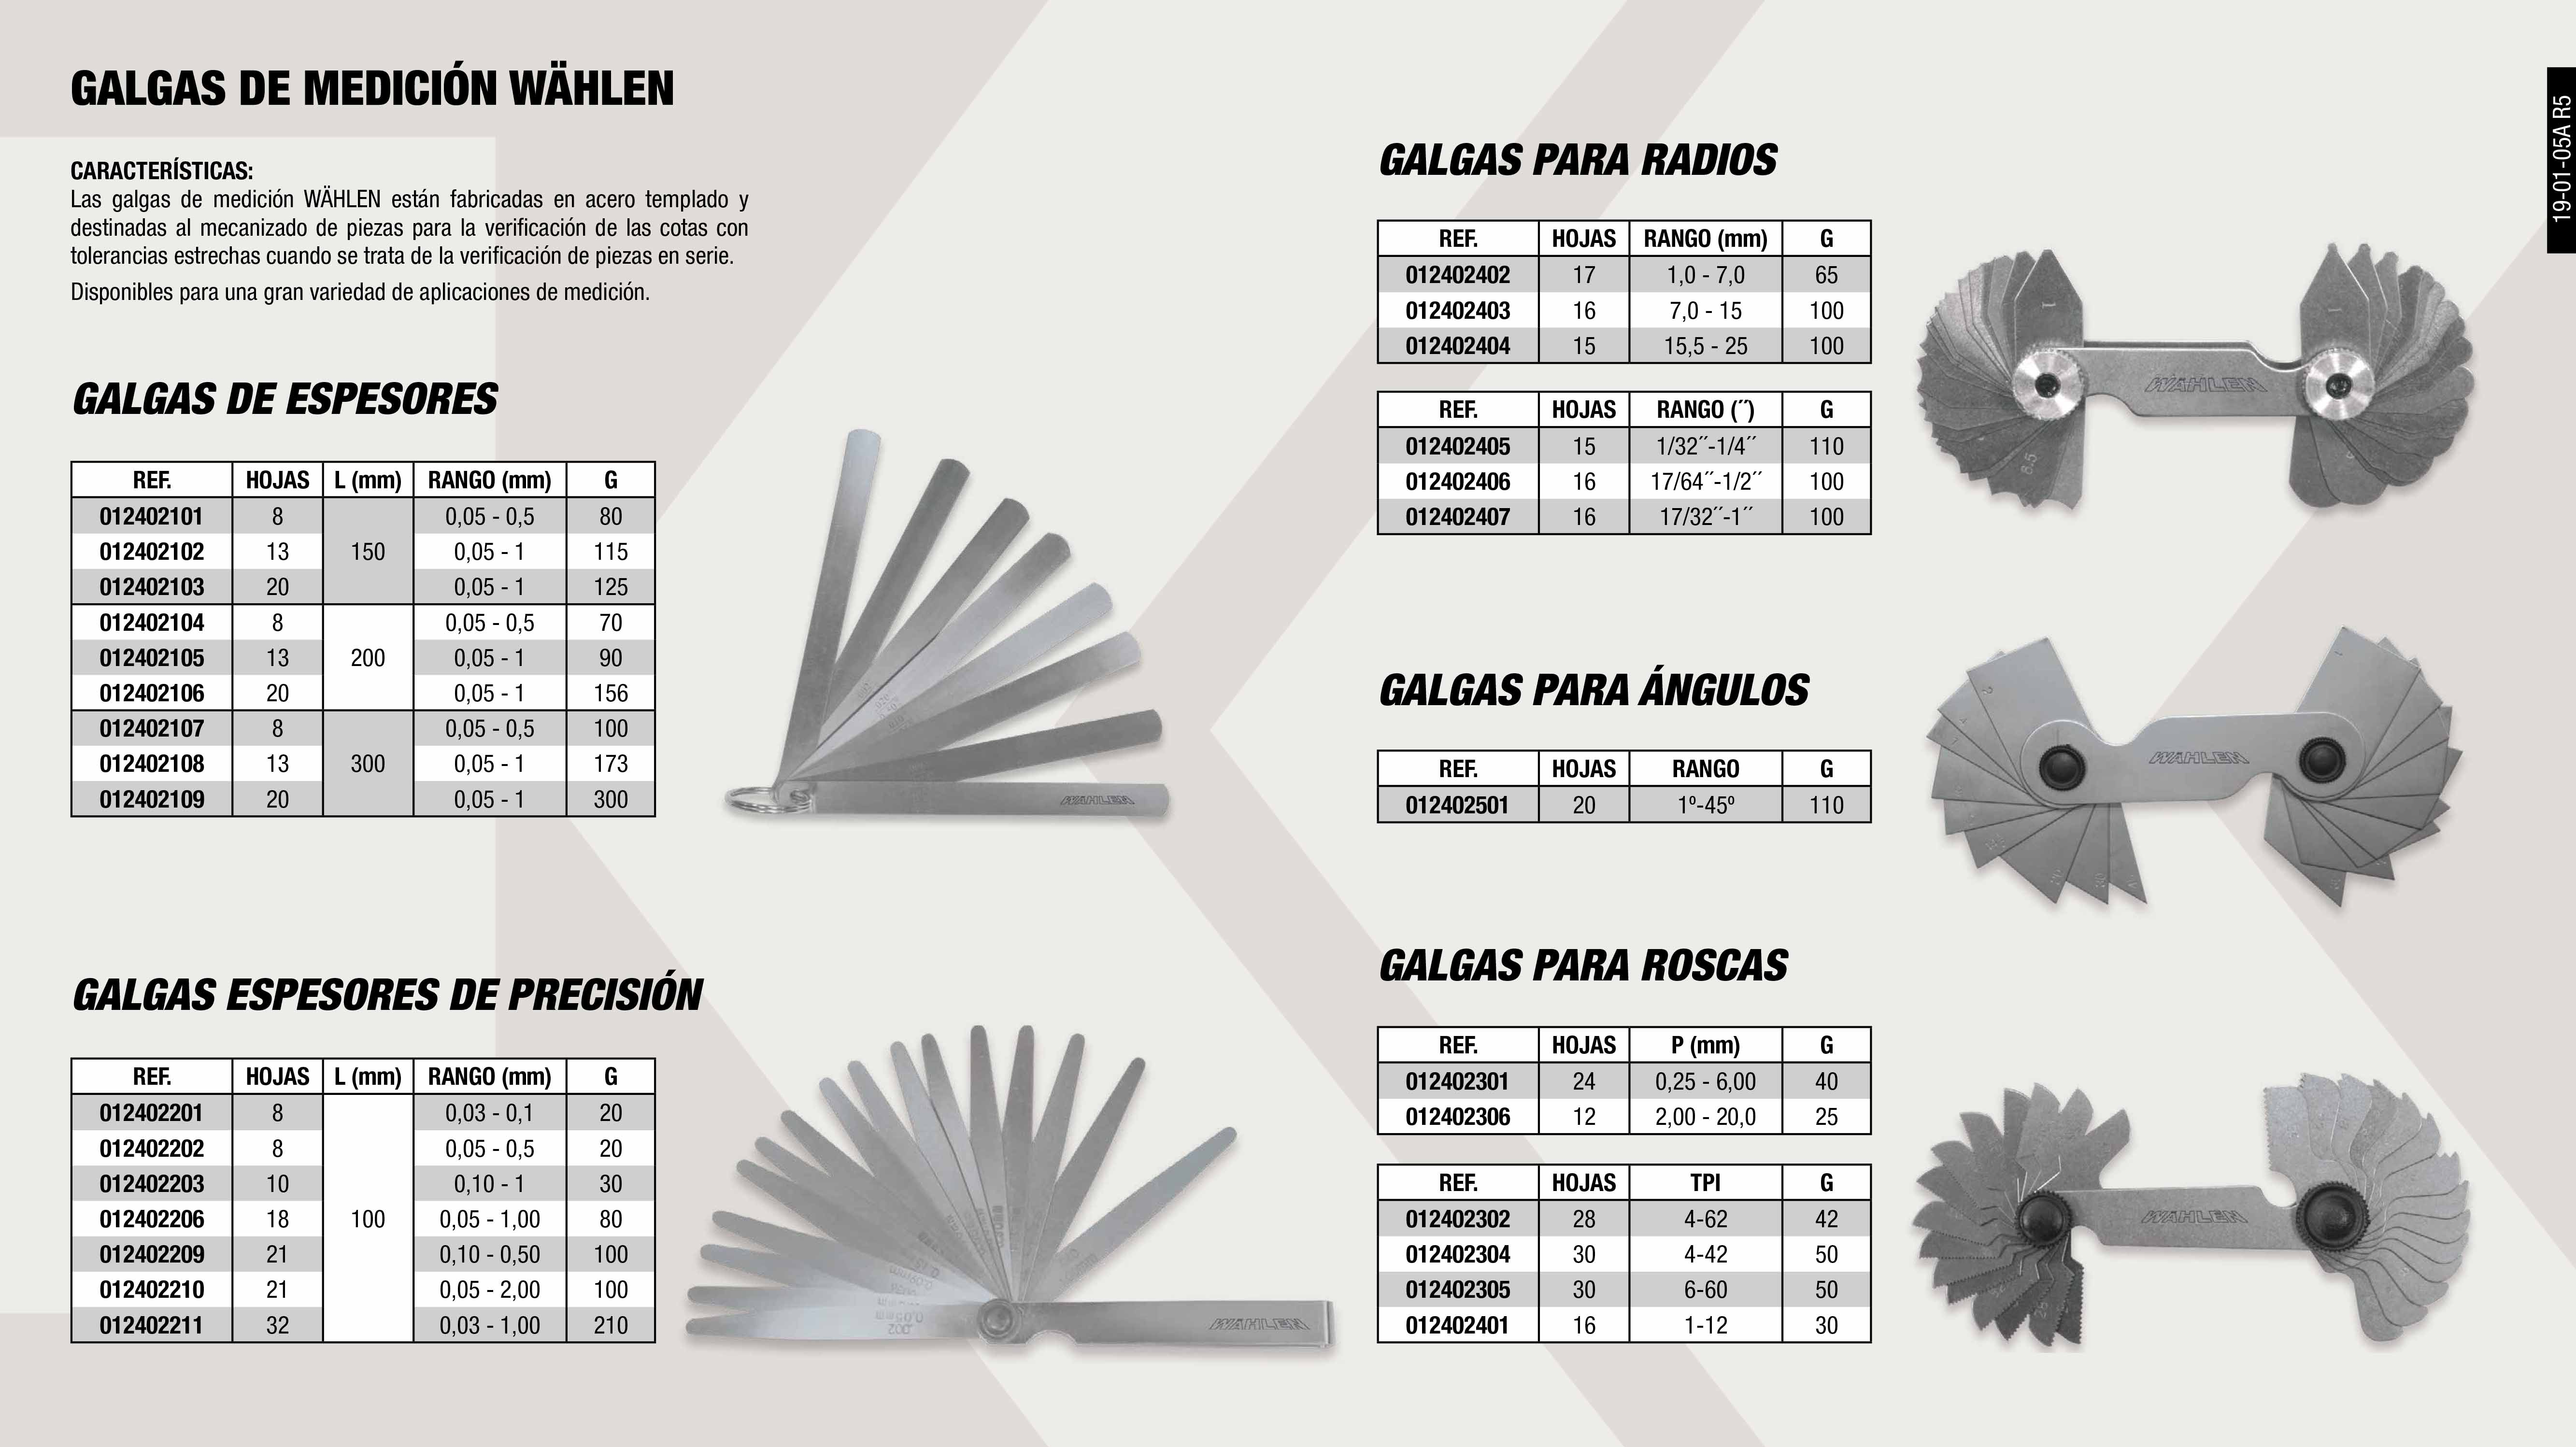 GALGAS ESPESORES 20 HOJAS, 150 MM, 0.05-1.0 MM              ,  GALGAS PARA ROSCAS, 6 HOJAS, 8-28 TPI                       ,  GALGAS ESPESORES PRECISION 20 HOJAS,100MM,0.05-1MM          ,  GALGAS ESPESORES PRECISION 21HOJAS,100MM,0.1-0.5MM          ,  GALGAS PARA ROSCAS, 30 HOJAS, 4-42 TPI                      ,  GALGAS ESPESORES 20 HOJAS, 200 MM, 0.05-1.0 MM              ,  GALGAS PARA ROSCAS, 28 HOJAS, 4-62 TPI                      ,  GALGAS PARA RADIOS, 15 HOJAS, 15.5 - 25MM                   ,  GALGAS ESPESORES 13 HOJAS, 300 MM, 0.05-1.0 MM              ,  GALGAS PARA RADIOS, 16 HOJAS, 7.5-15 MM                     ,  GALGAS PARA RADIOS, 15 HOJAS, 1/32' - 1/4'                  ,  GALGAS PARA RADIOS, 16 HOJAS, 17/32' - 1'                   ,  GALGA ESPESORES 8 HOJAS, 200 MM, 0.05-0.5 MM                ,  GALGAS ESPESORES PRECISION 18HOJAS,100MM,0.05-1MM           ,  GALGAS PARA RADIOS, 17 HOJAS, 1.0-7.0 MM                    ,  GALGAS PARA RADIOS, 15 HOJAS, 1/32' - 1/4'                  ,  GALGAS ESPESORES 8HOJAS, 150 MM, 0.05-0.5 MM                ,  GALGAS ESPESORES 13 HOJAS, 150 MM, 0.05-1.0 MM              ,  GALGAS PAR ANGULOS 20 HOJAS 1º - 45º                        ,  GALGAS ESPESORES 20 HOJAS, 300 MM, 0.05-1.0 MM              ,  GALGA ESPESORES PRECISION 8 HOJAS,100MM,0.03-0.1MM          ,  GALGAS ESPESORES PRECISION 10HOJAS,100MM,0.01-1MM           ,  GALGAS PARA ROSCAS, 16 HOJAS, 1-12 TPI                      ,  GALGAS ESPESORES 8 HOJAS, 300 MM, 0.05-0.5 MM               ,  GALGAS ESPESOR PRECISION 32HOJAS,100MM,0.03-1.0MM           ,  GALGAS ESPESORES PRECISION 8HOJAS,100MM,0.05-0.5MM          ,  GALGAS ESPESORES PRECISION 15HOJAS,100MM,0.05-1MM           ,  GALGAS ESPESOR PRECISION 21HOJAS,100MM,0.05-2.0MM           ,  GALGAS PARA ROSCAS, 24 HOJAS, 0.25-6.00 MM                  ,  GALGAS PARA ROSCAS, 30 HOJAS, 6-60 TPI                      ,  GALGAS ESPESORES 13 HOJAS, 200 MM, 0.05-1.0 MM              ,  GALGAS ESPESORES PRECISION 13HOJAS,100MM,0.05-1